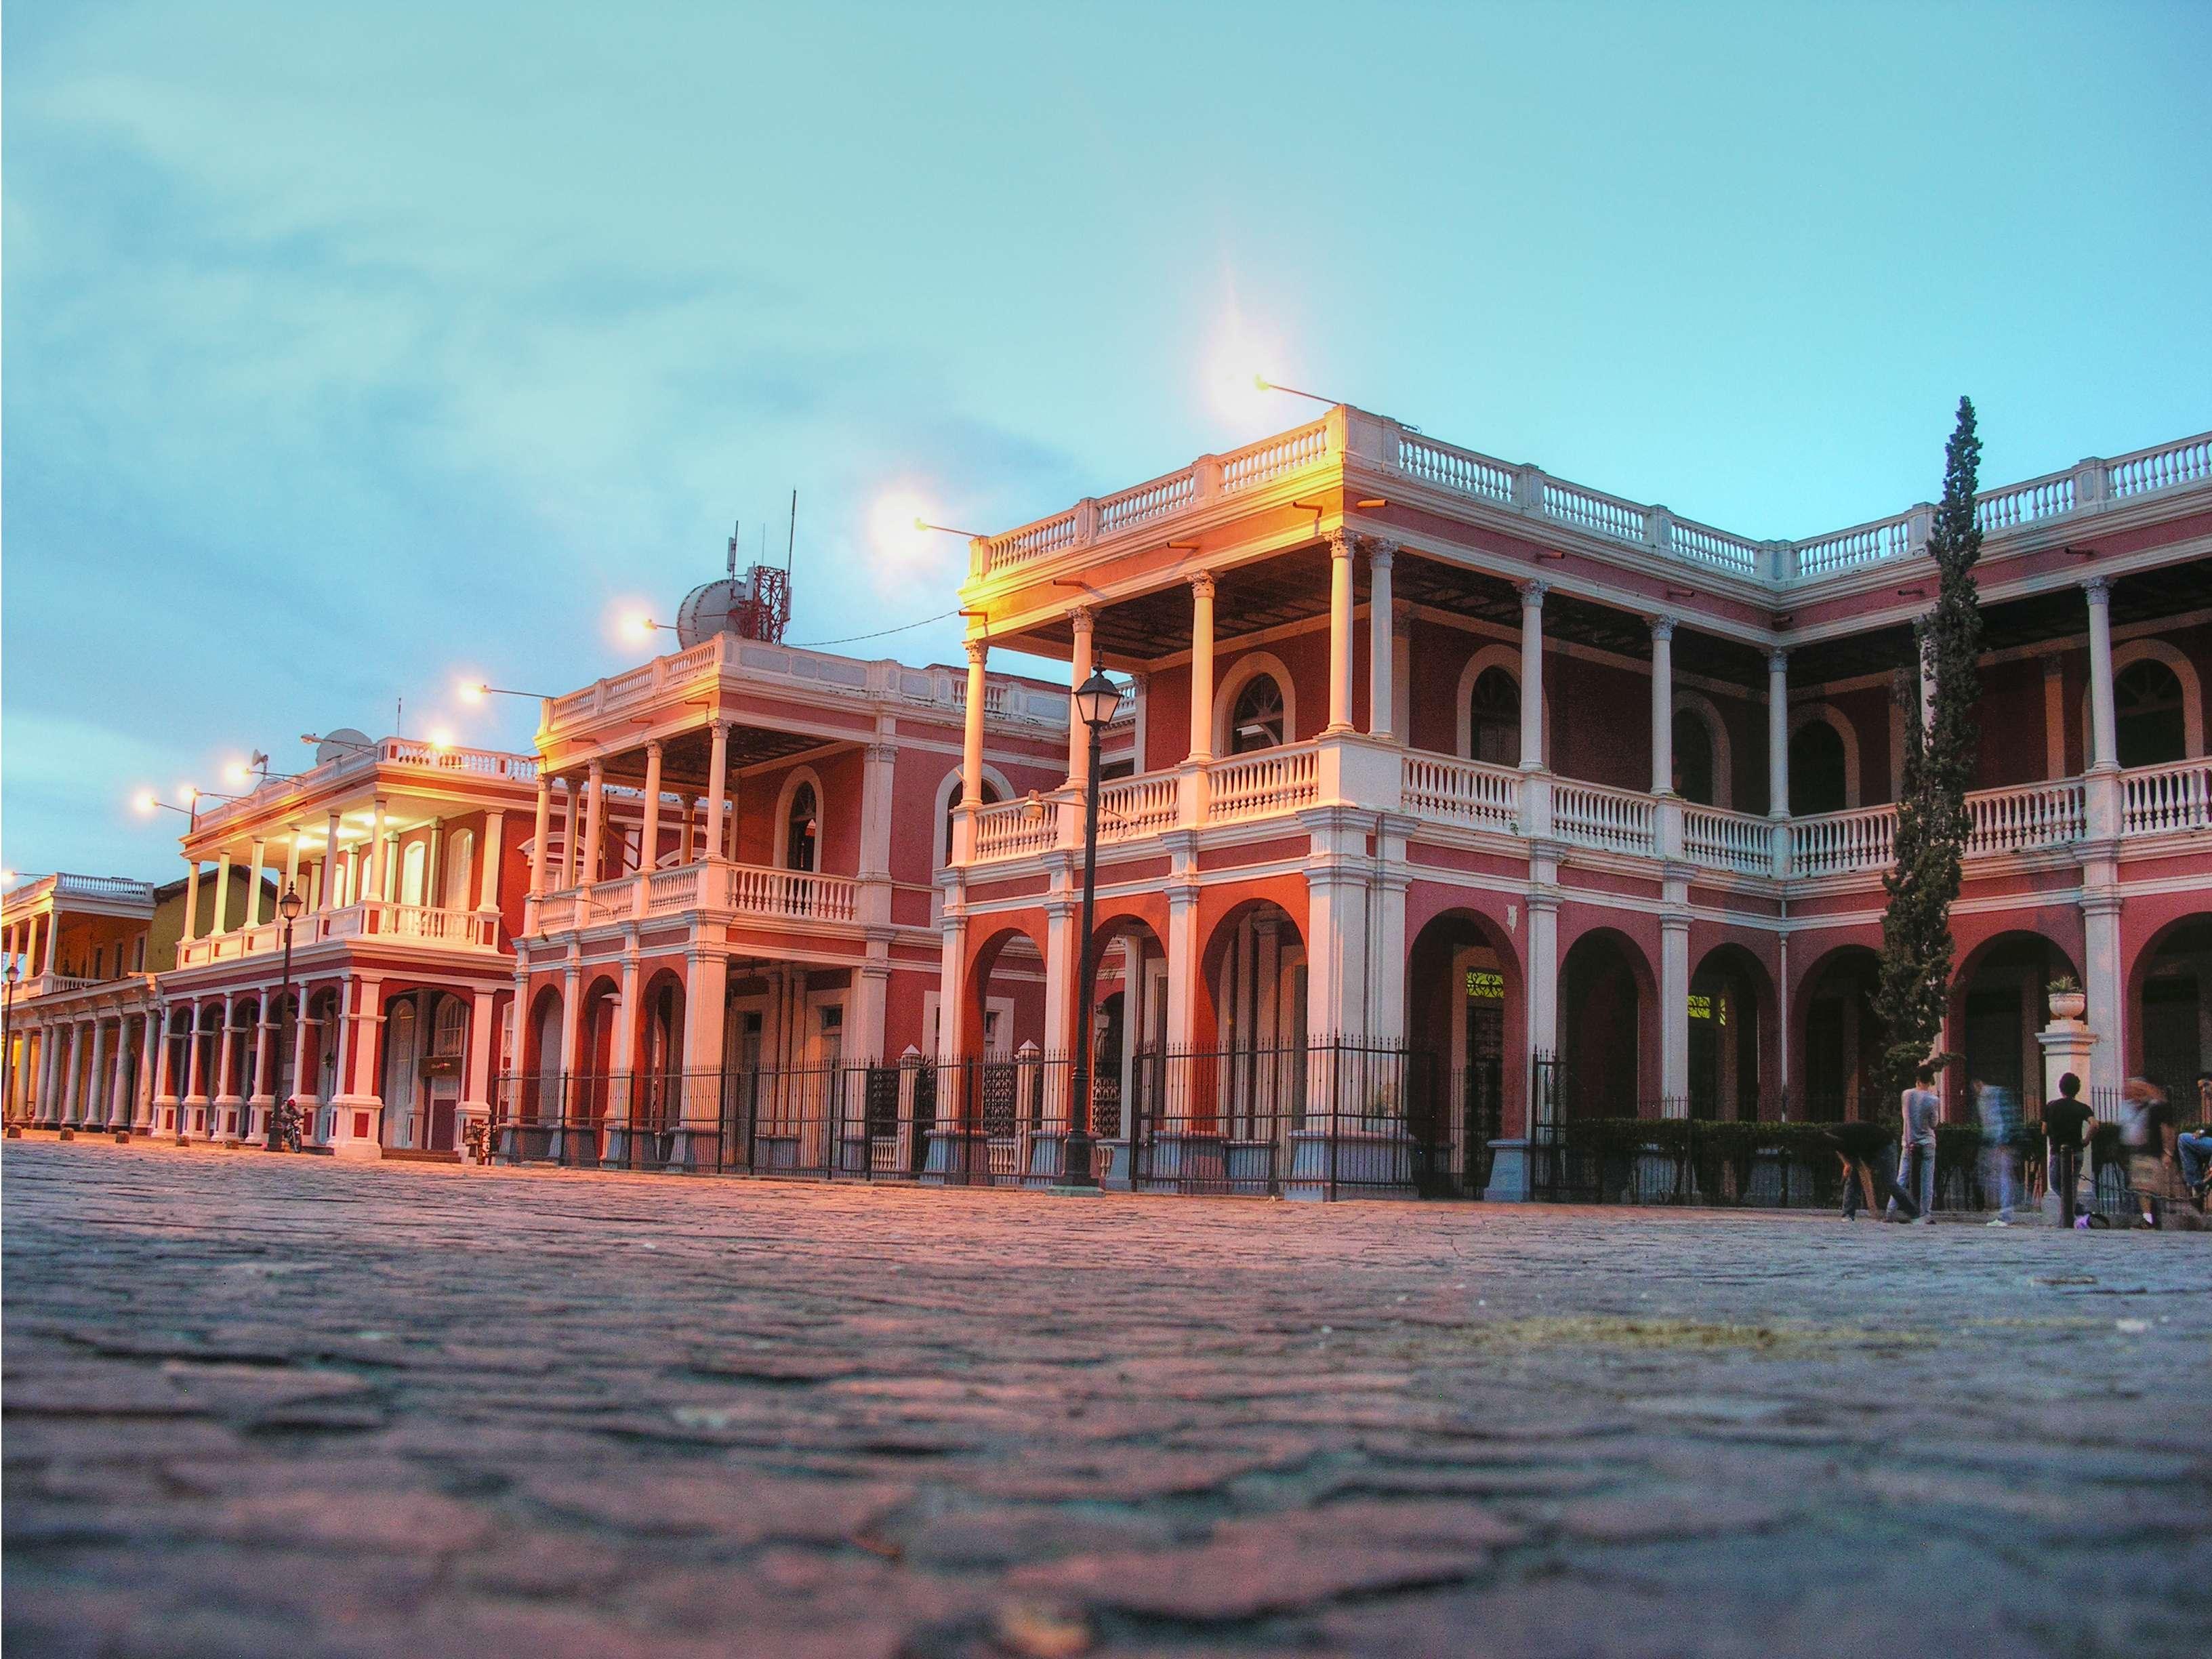 Granada Nicaragua  city photos gallery : Granada Nicaragua 9 Wikimedia Commons